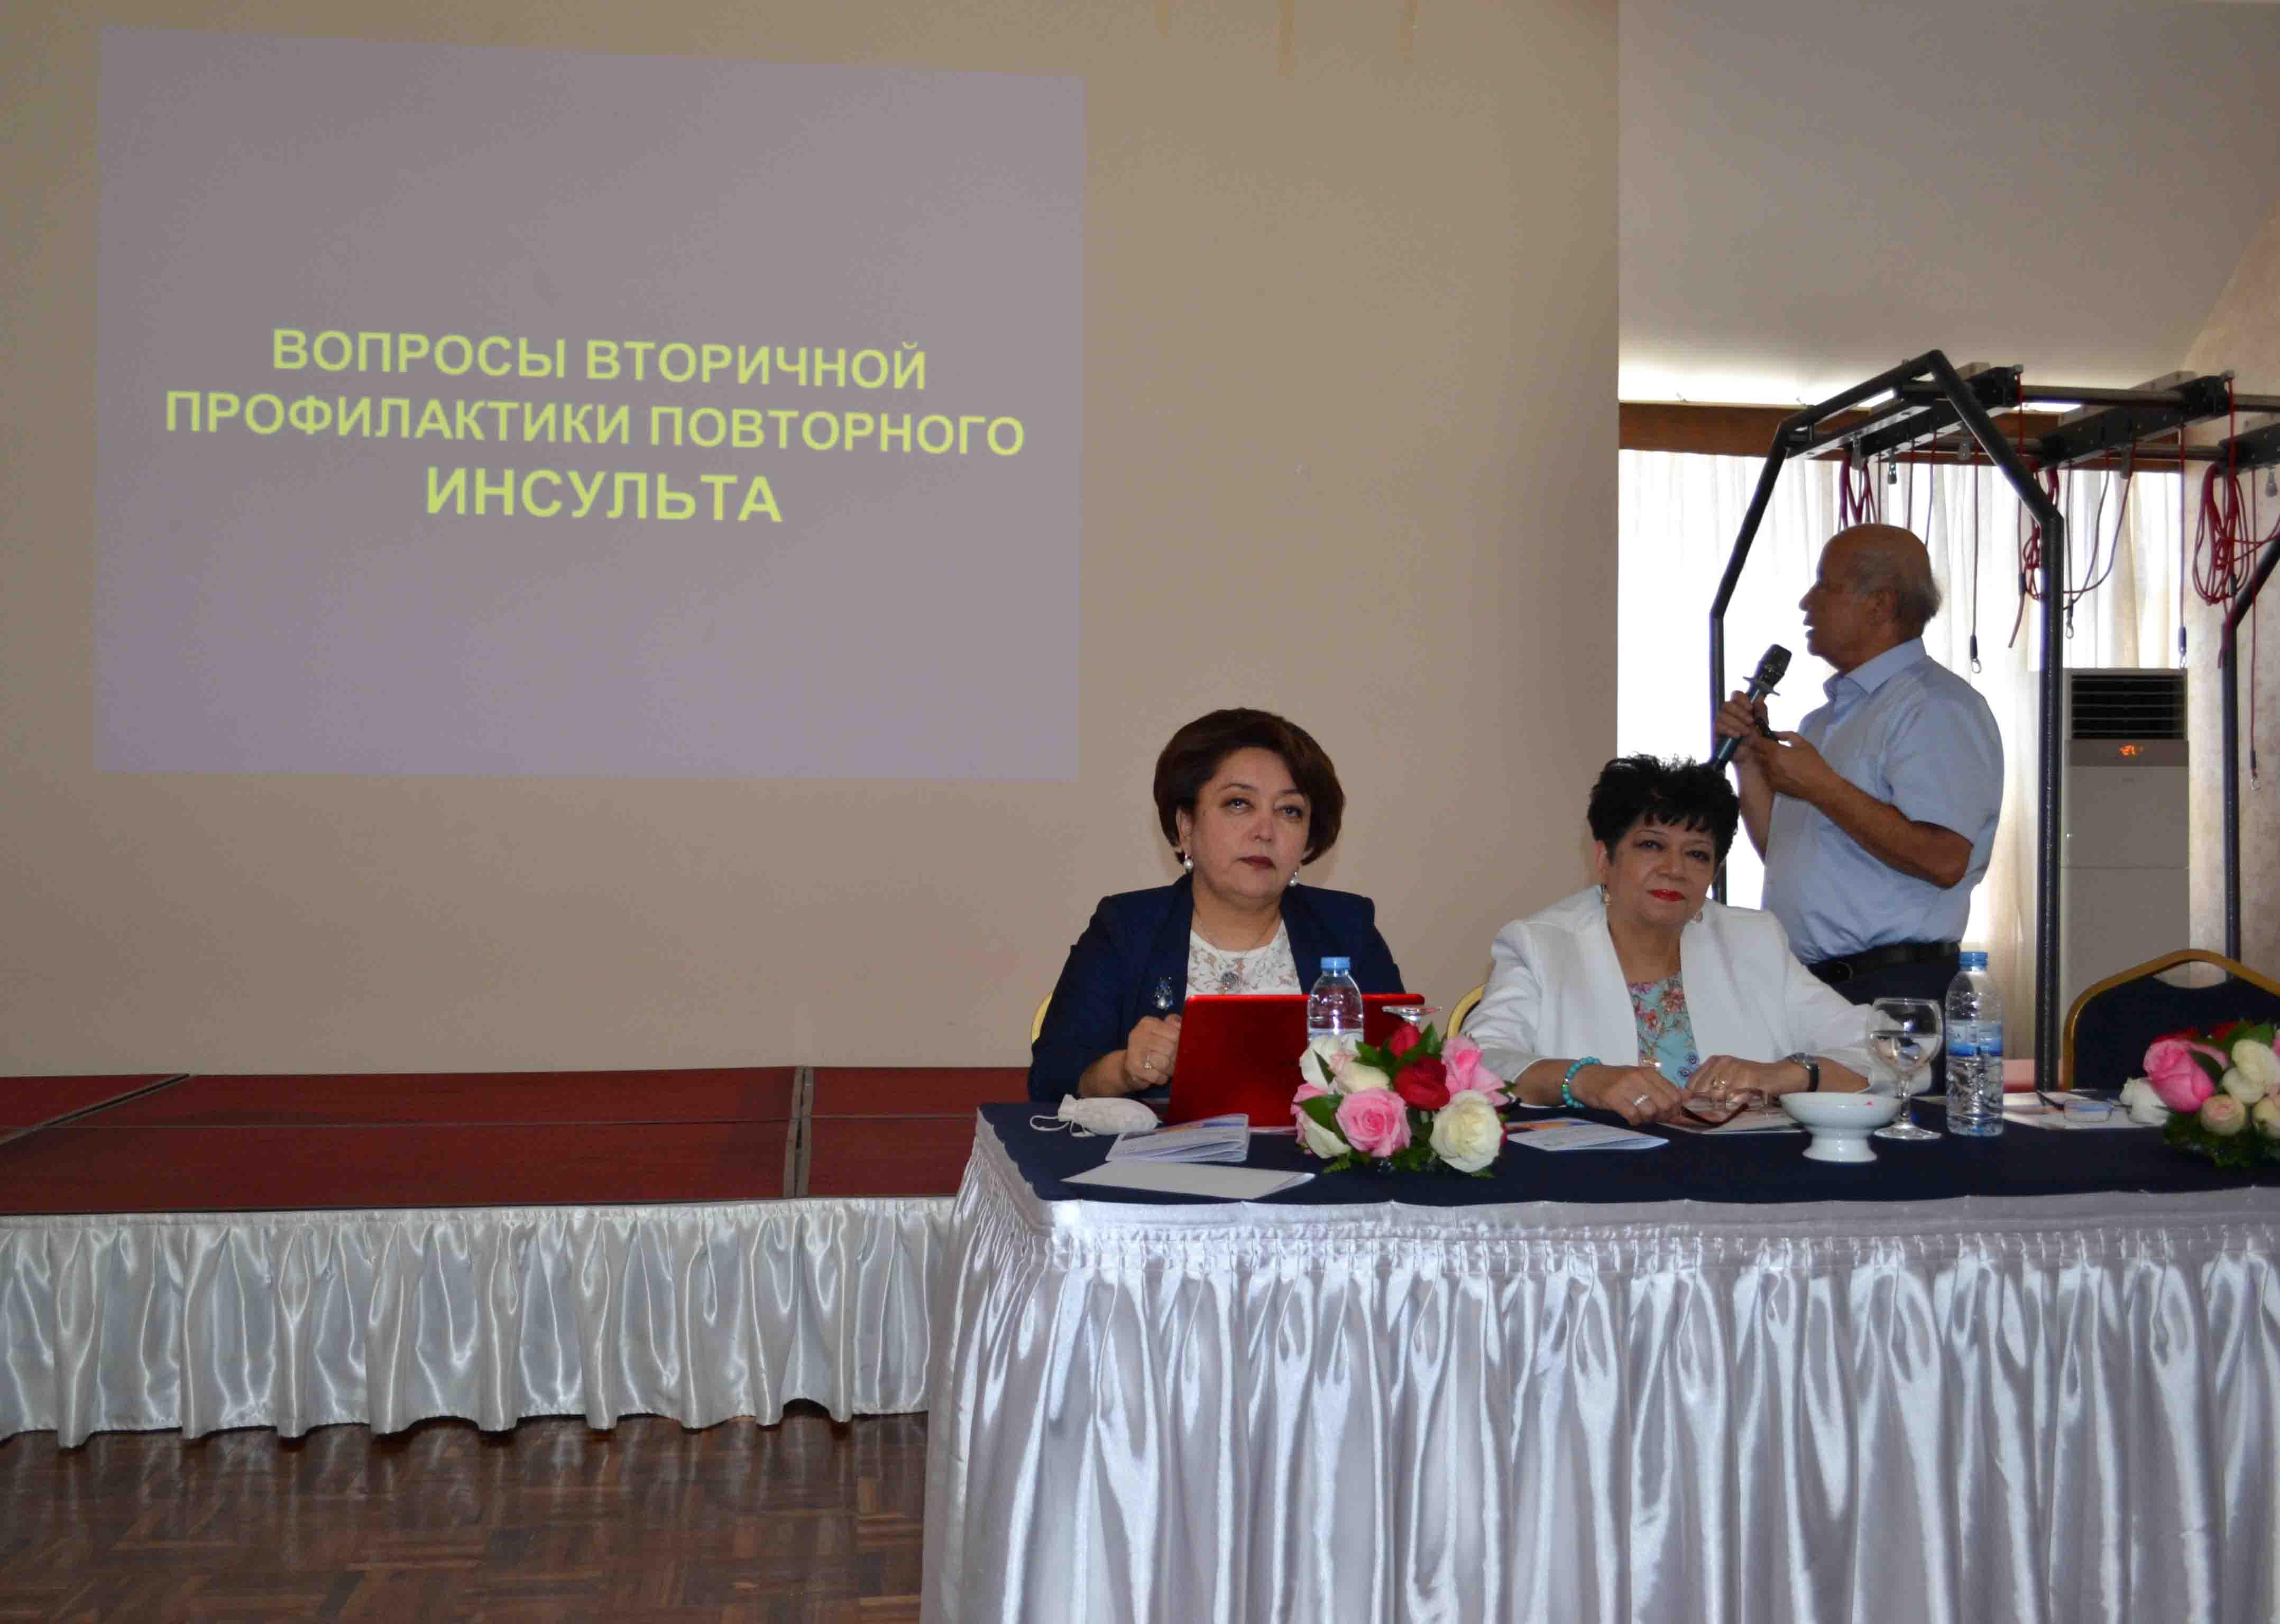 http://medicalexpress.ru/uploads/reportss/DSC_1568.jpg